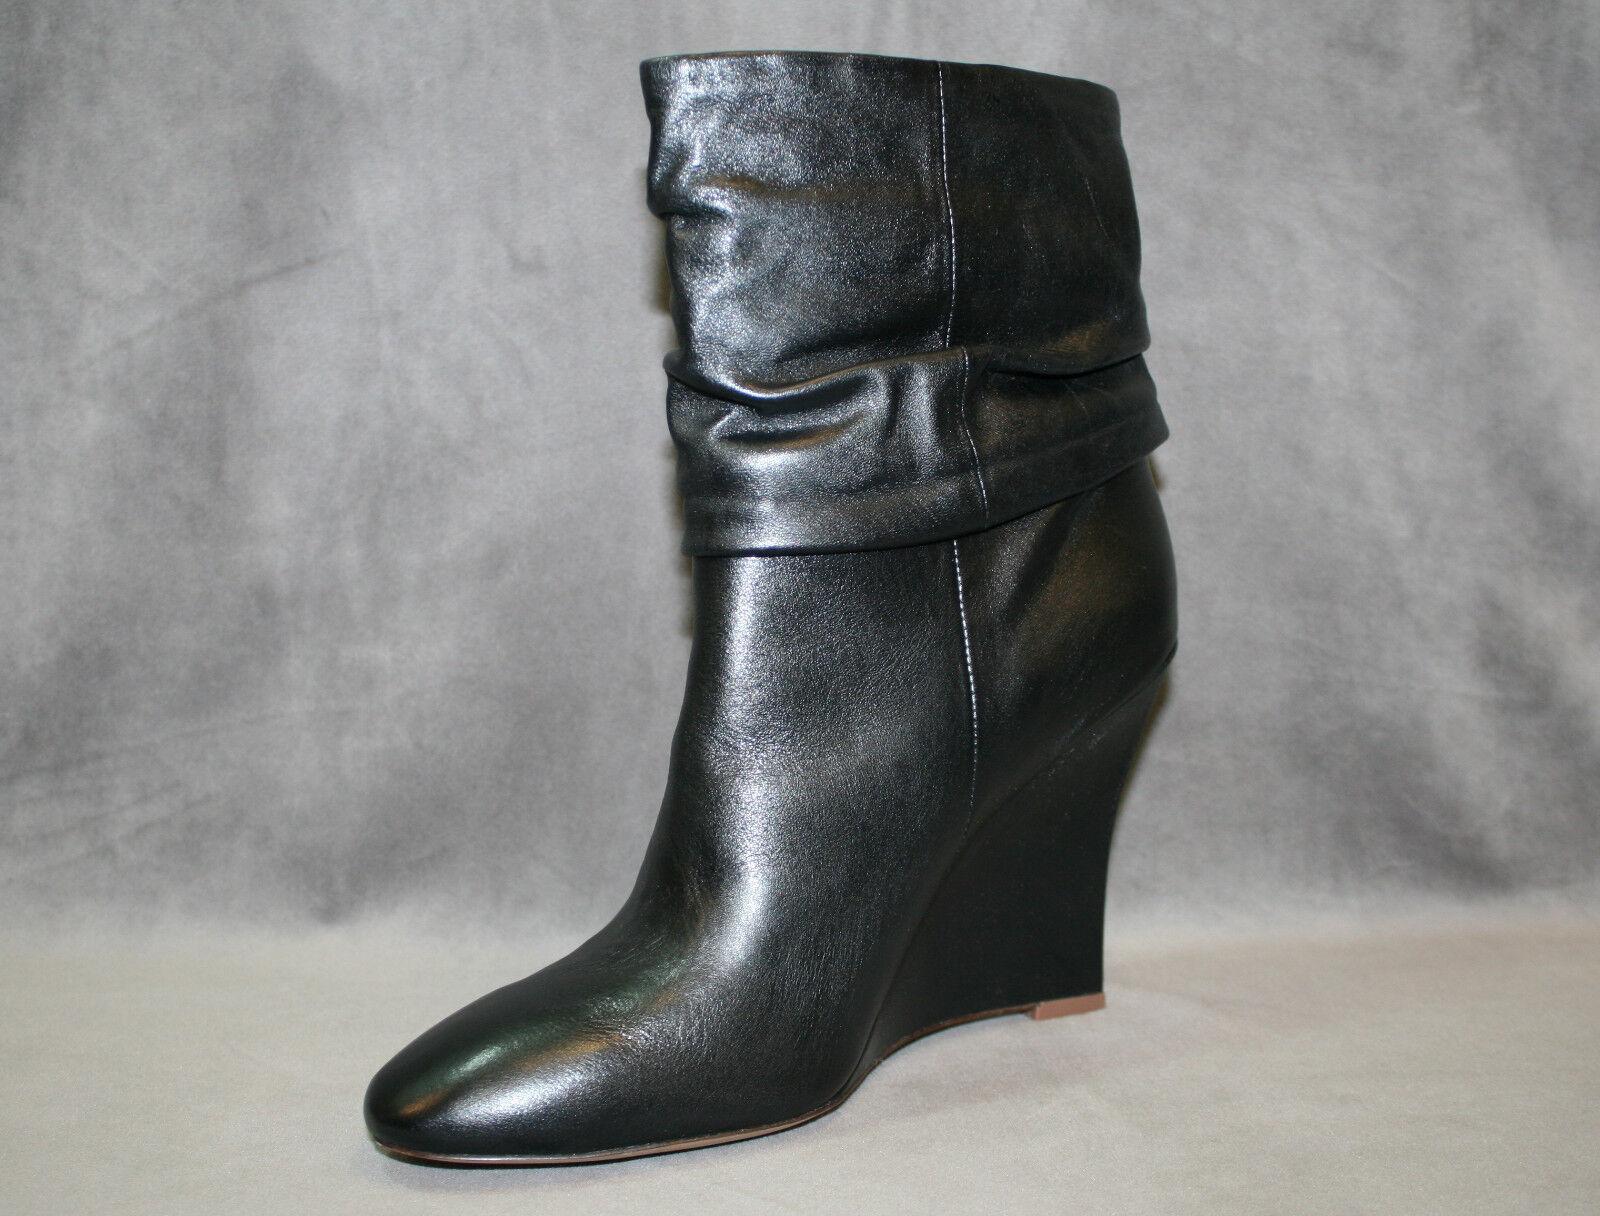 NEW ELIE TAHARI BLACK BLACK TAHARI LEATHER FALLON BOOTIE WEDGE Stiefel Schuhe SZ 40.5 US 10.5 918936